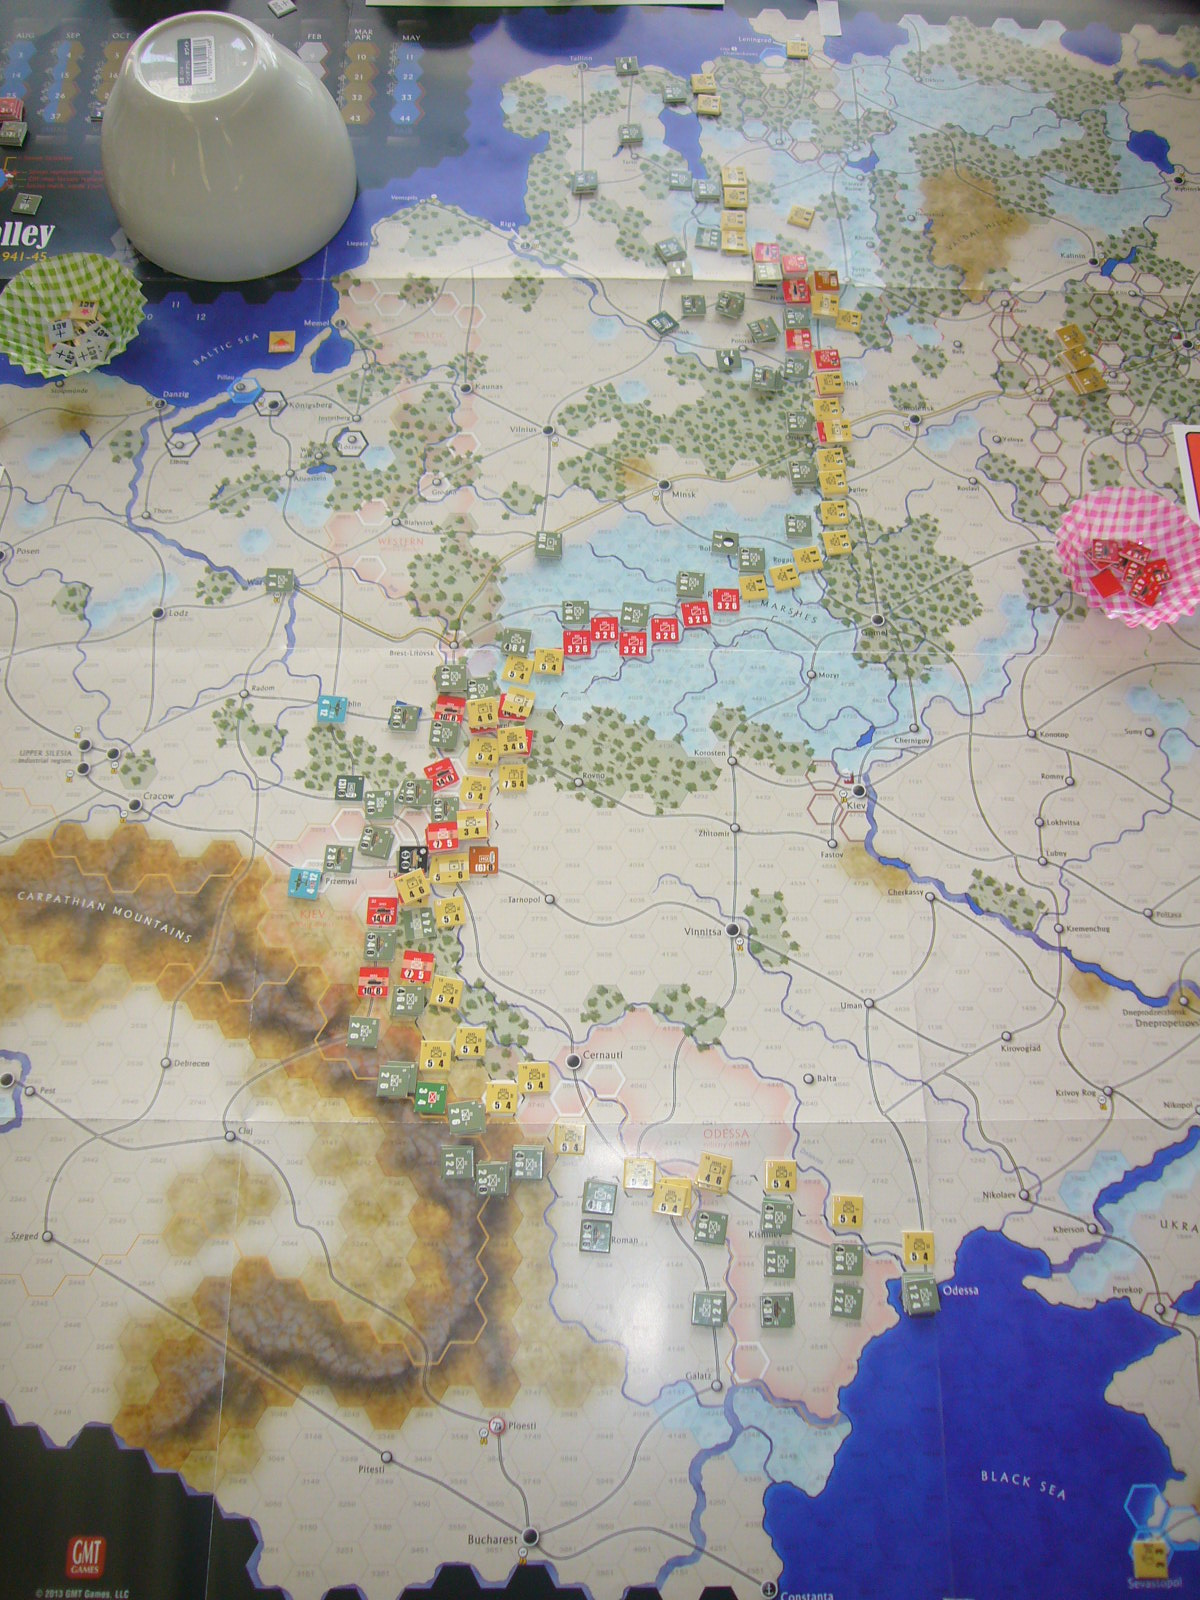 6/21 YSGA第300回定例会の様子その3(GMT)ダーク・バレー「1944バグラチオン作戦」シナリオ3人戦)_b0173672_23033782.jpg